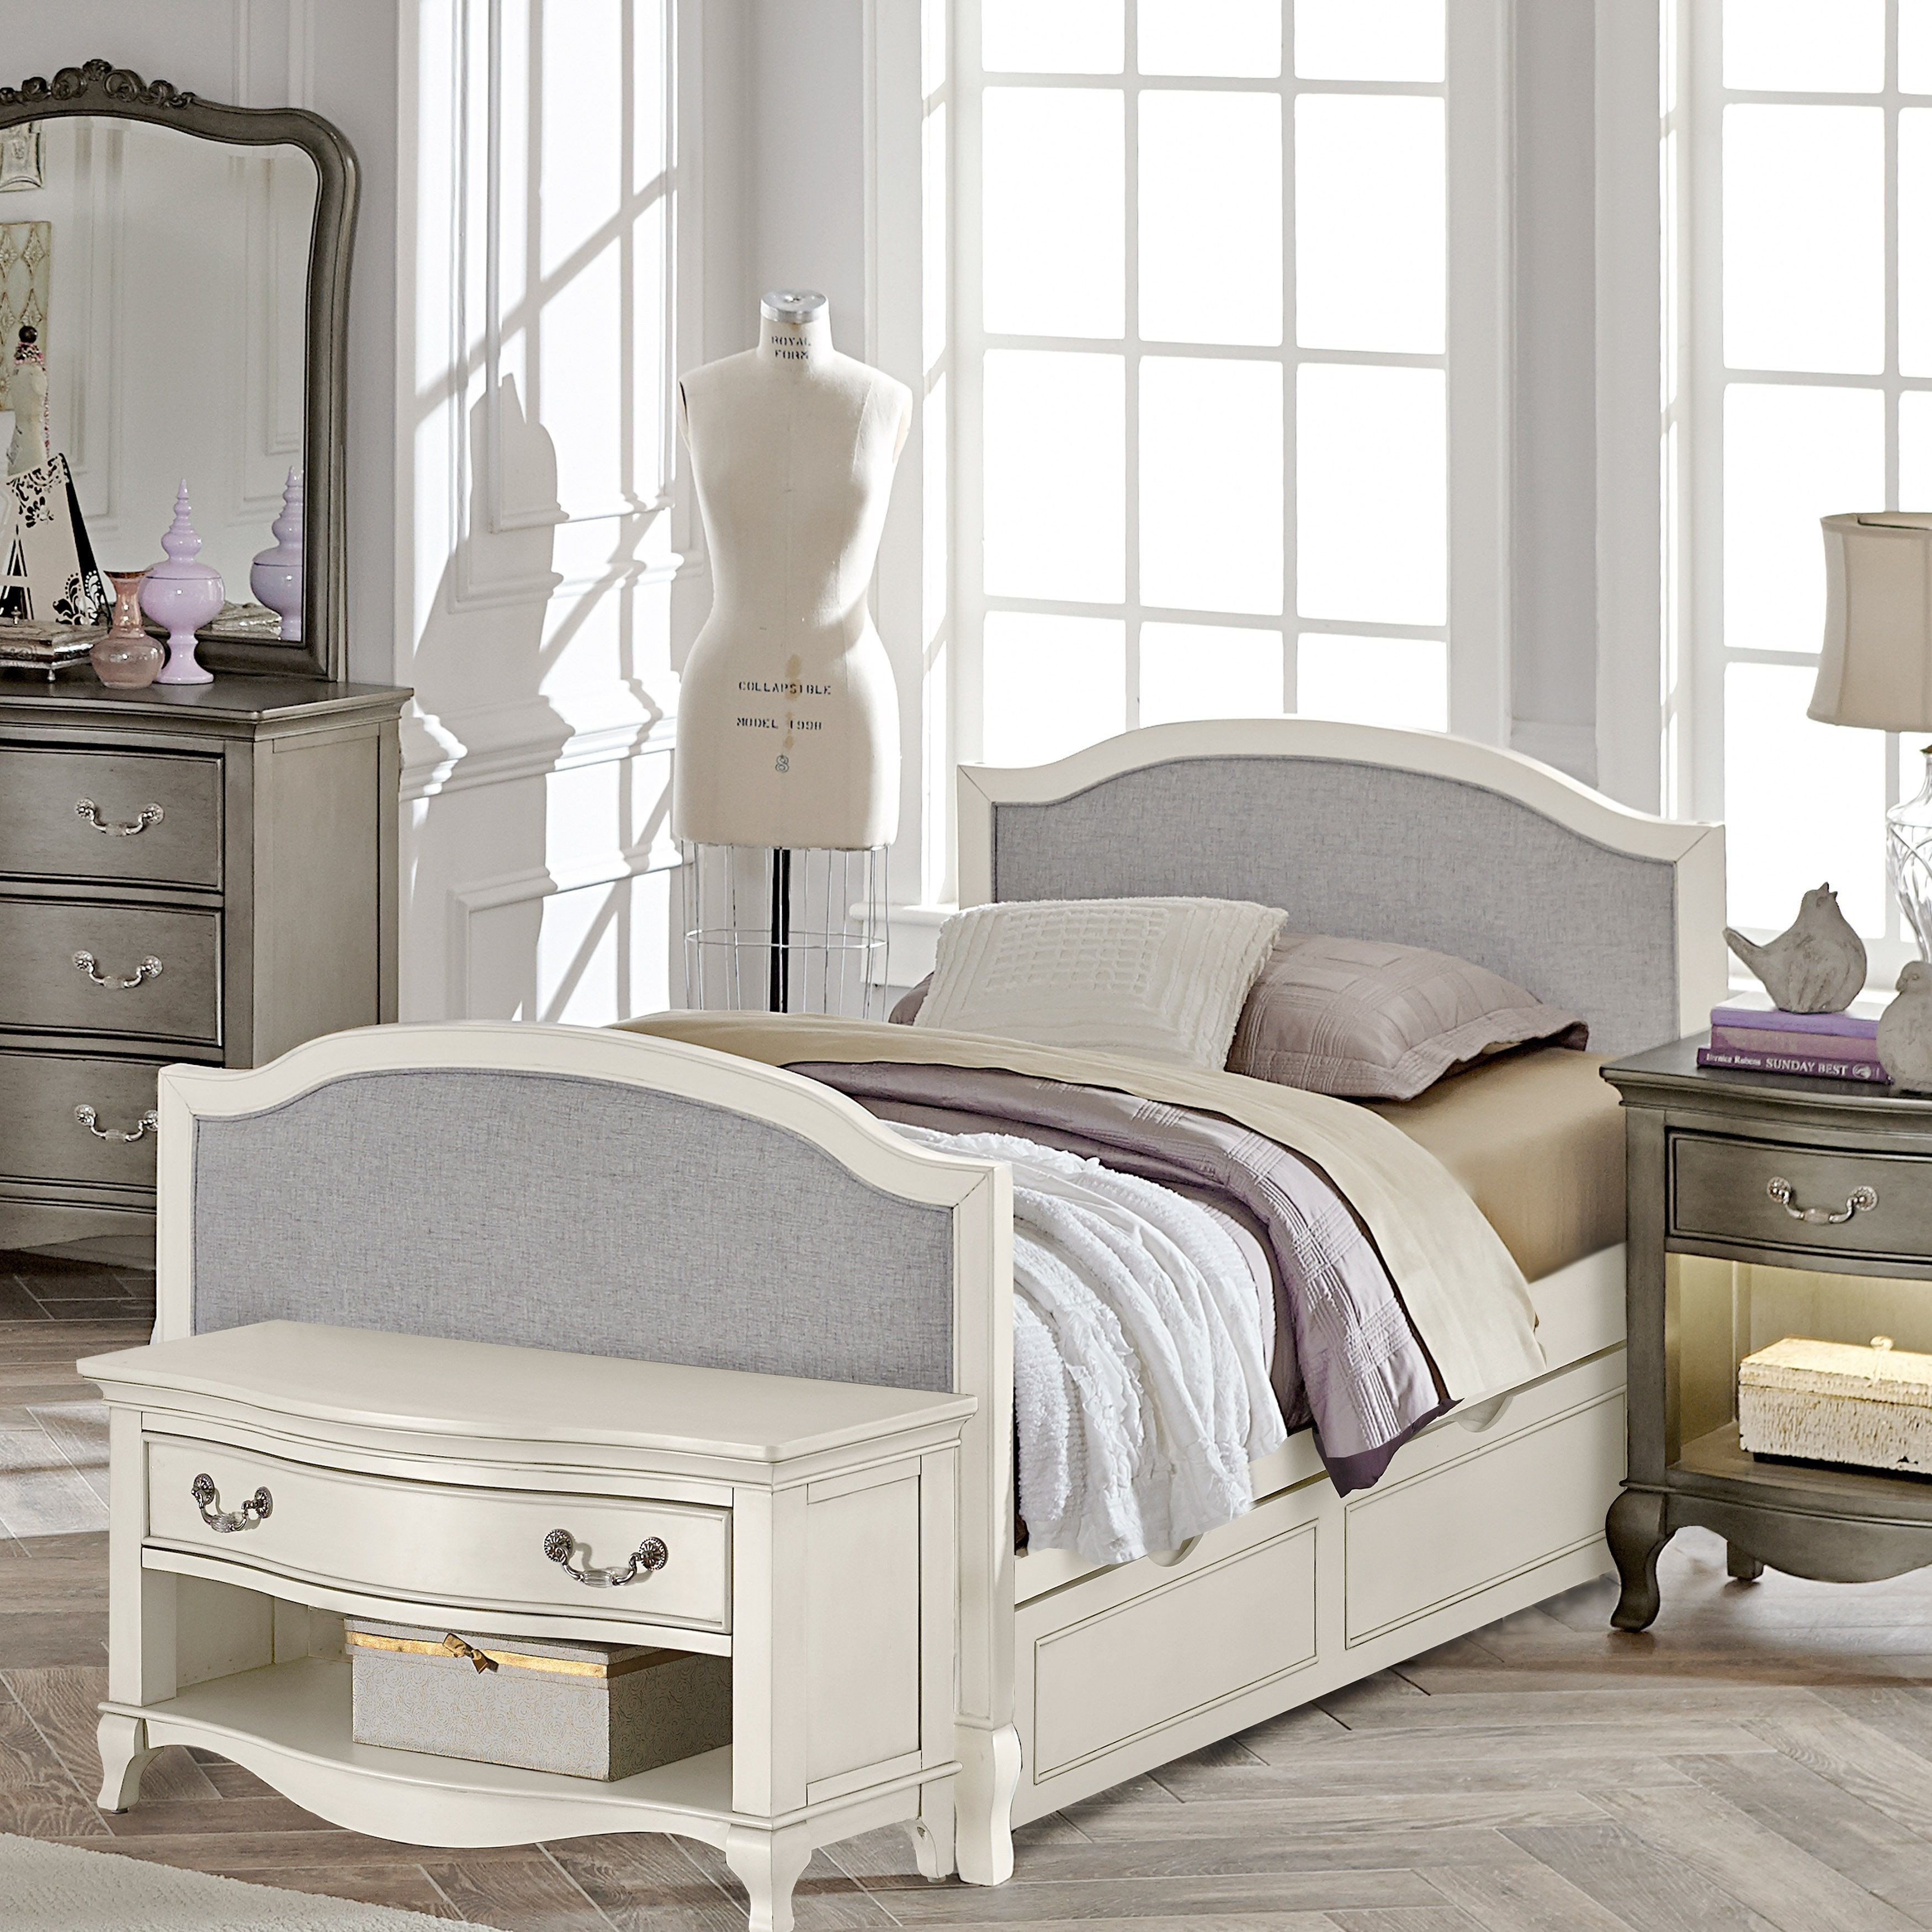 Childrens White Bedroom Furniture Lovely Ne Kids Kensington Victoria Antique Twin Size Upholstered